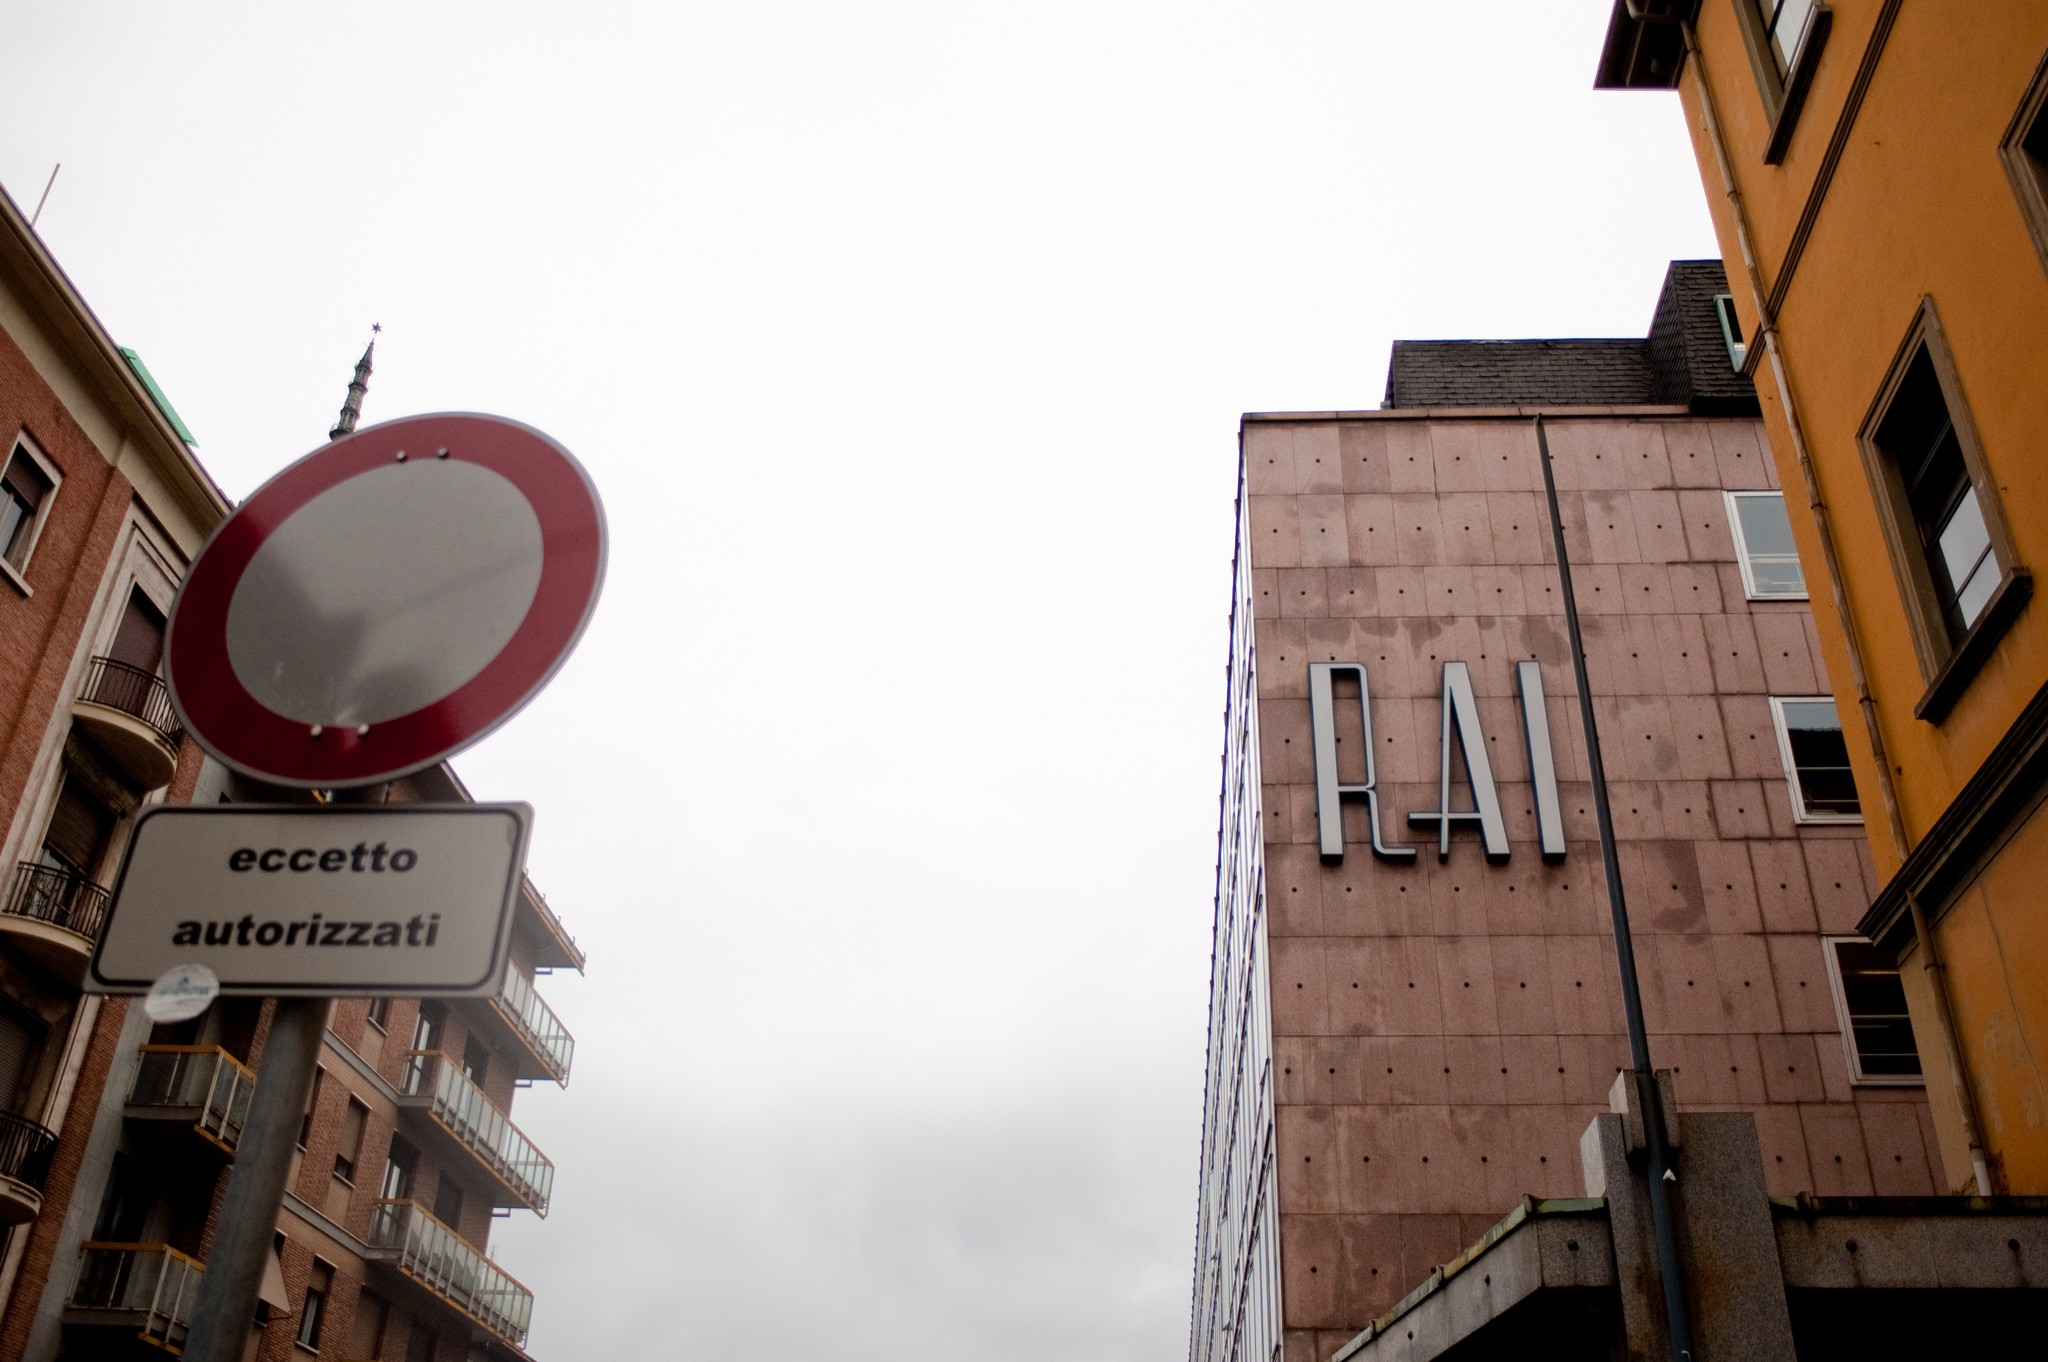 Turin, April 2010